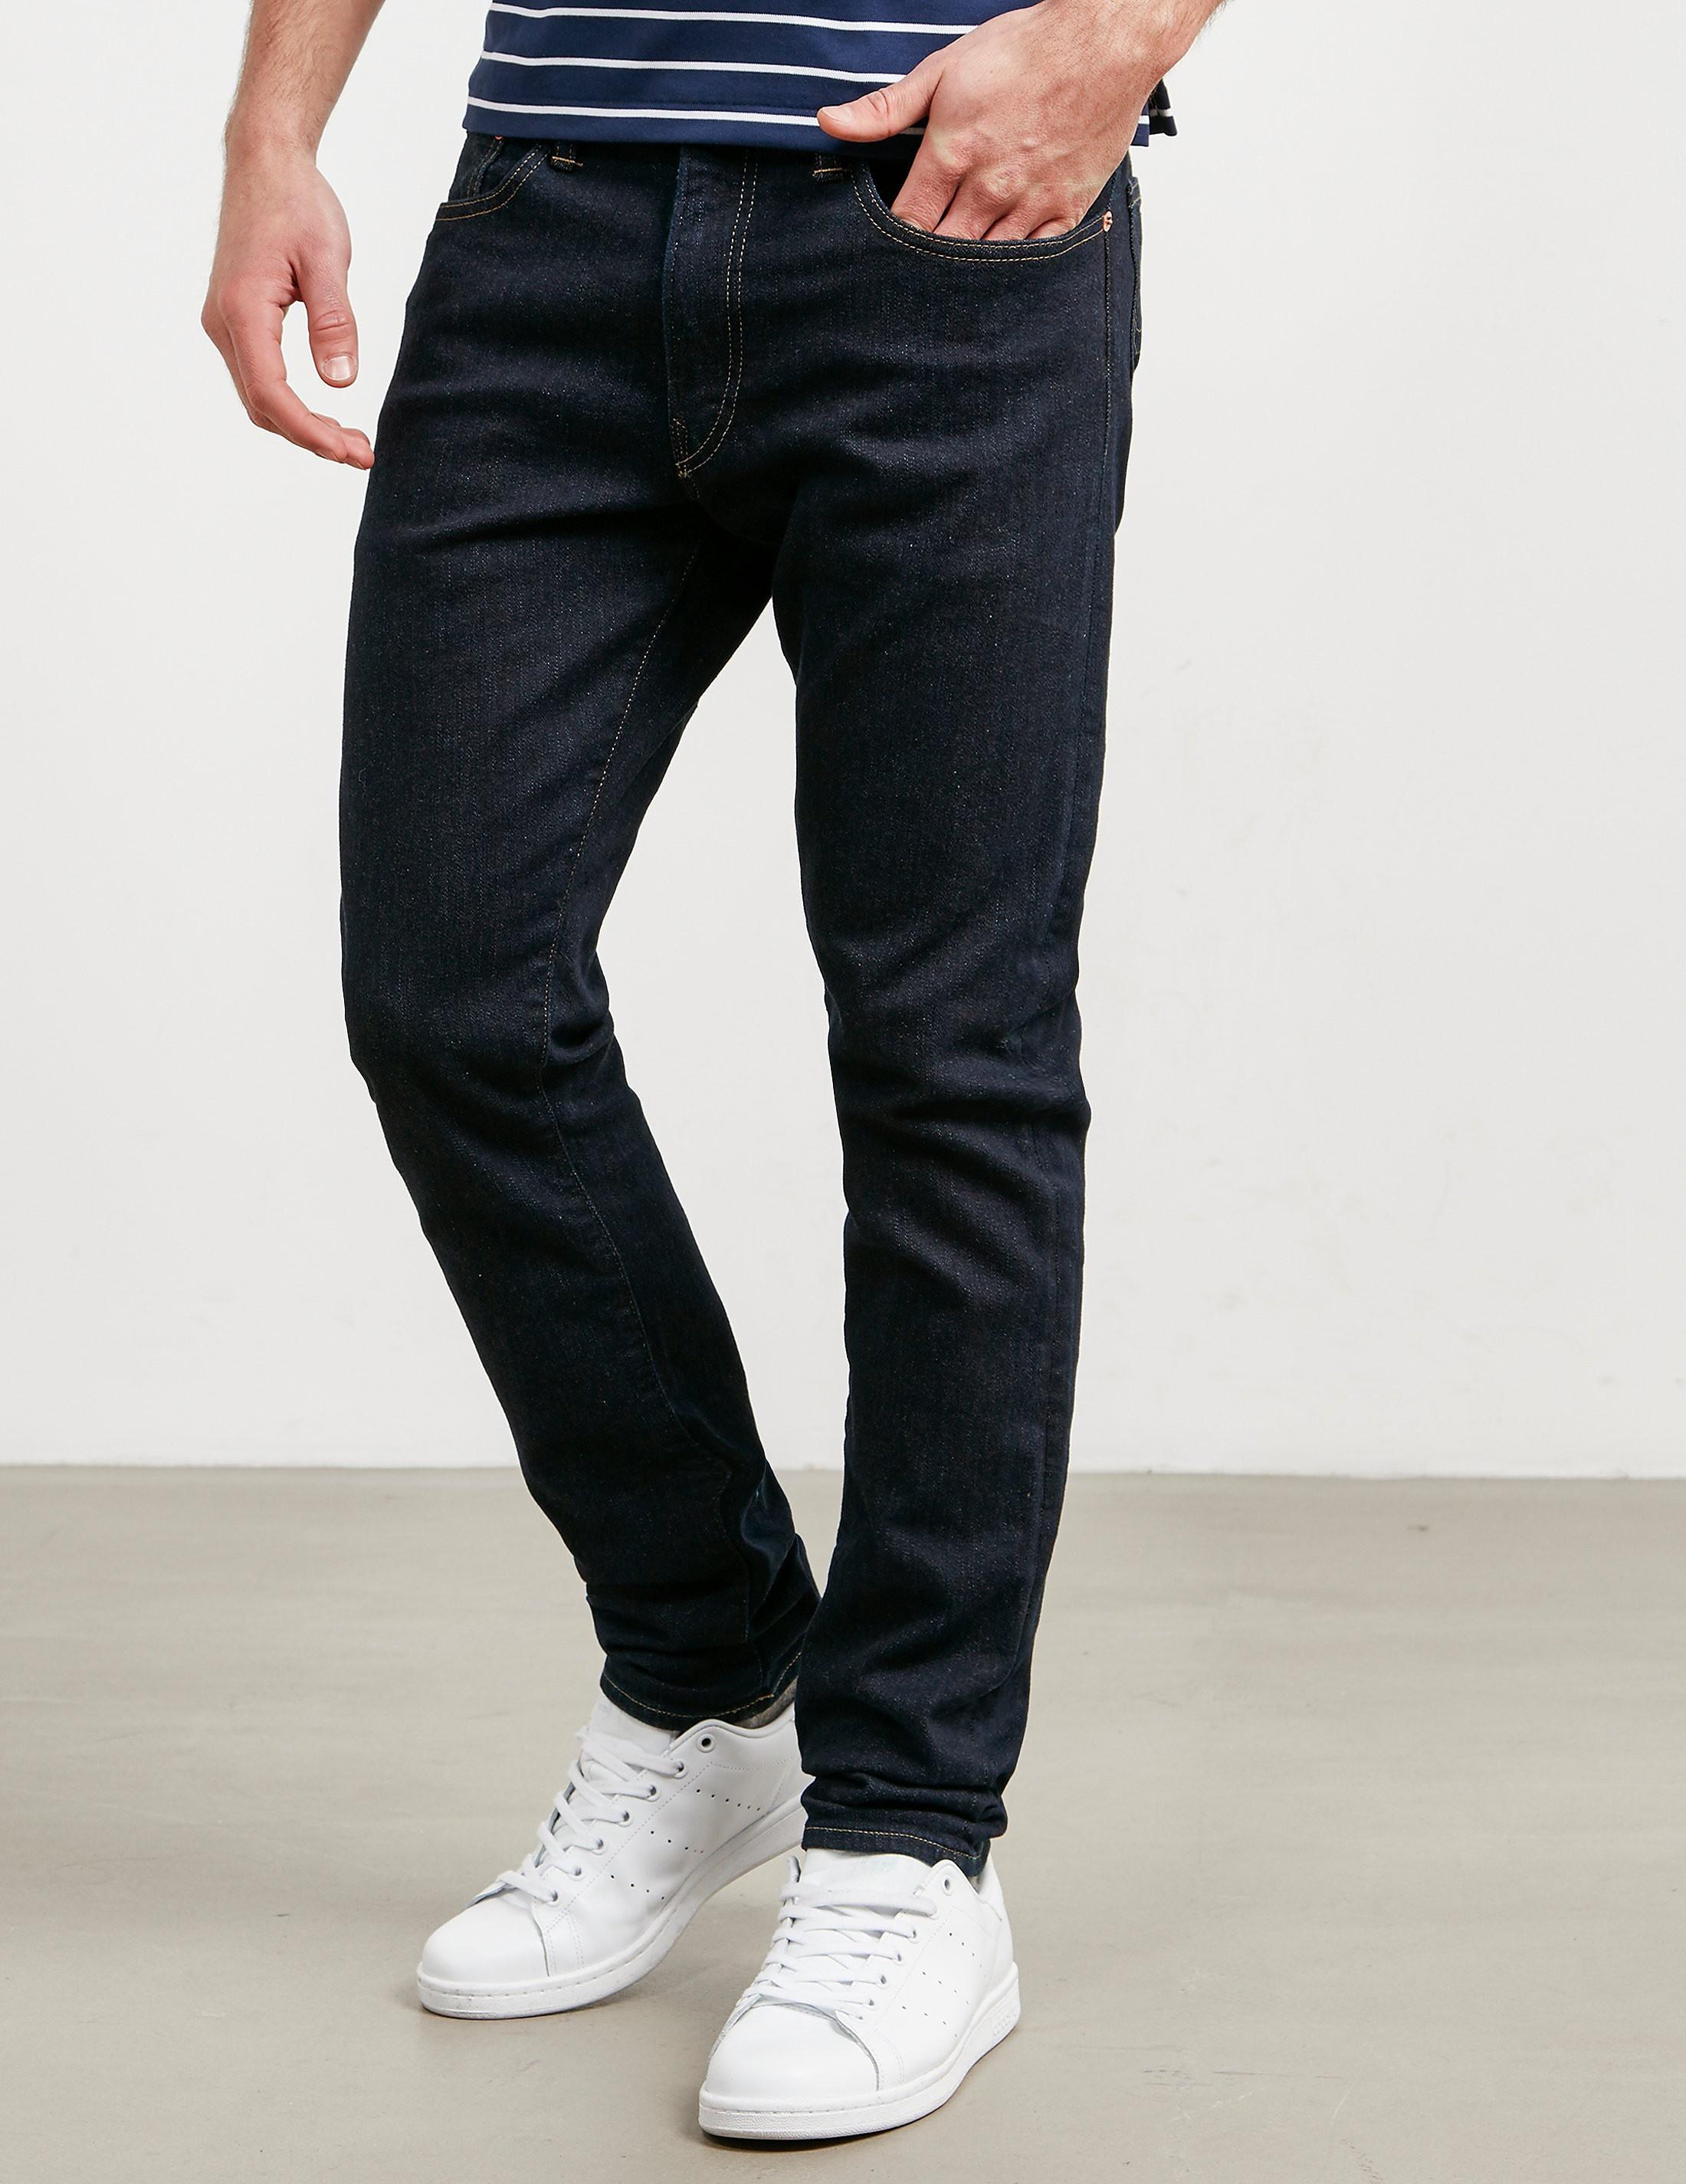 Polo Ralph Lauren Sullivan Slim Jeans